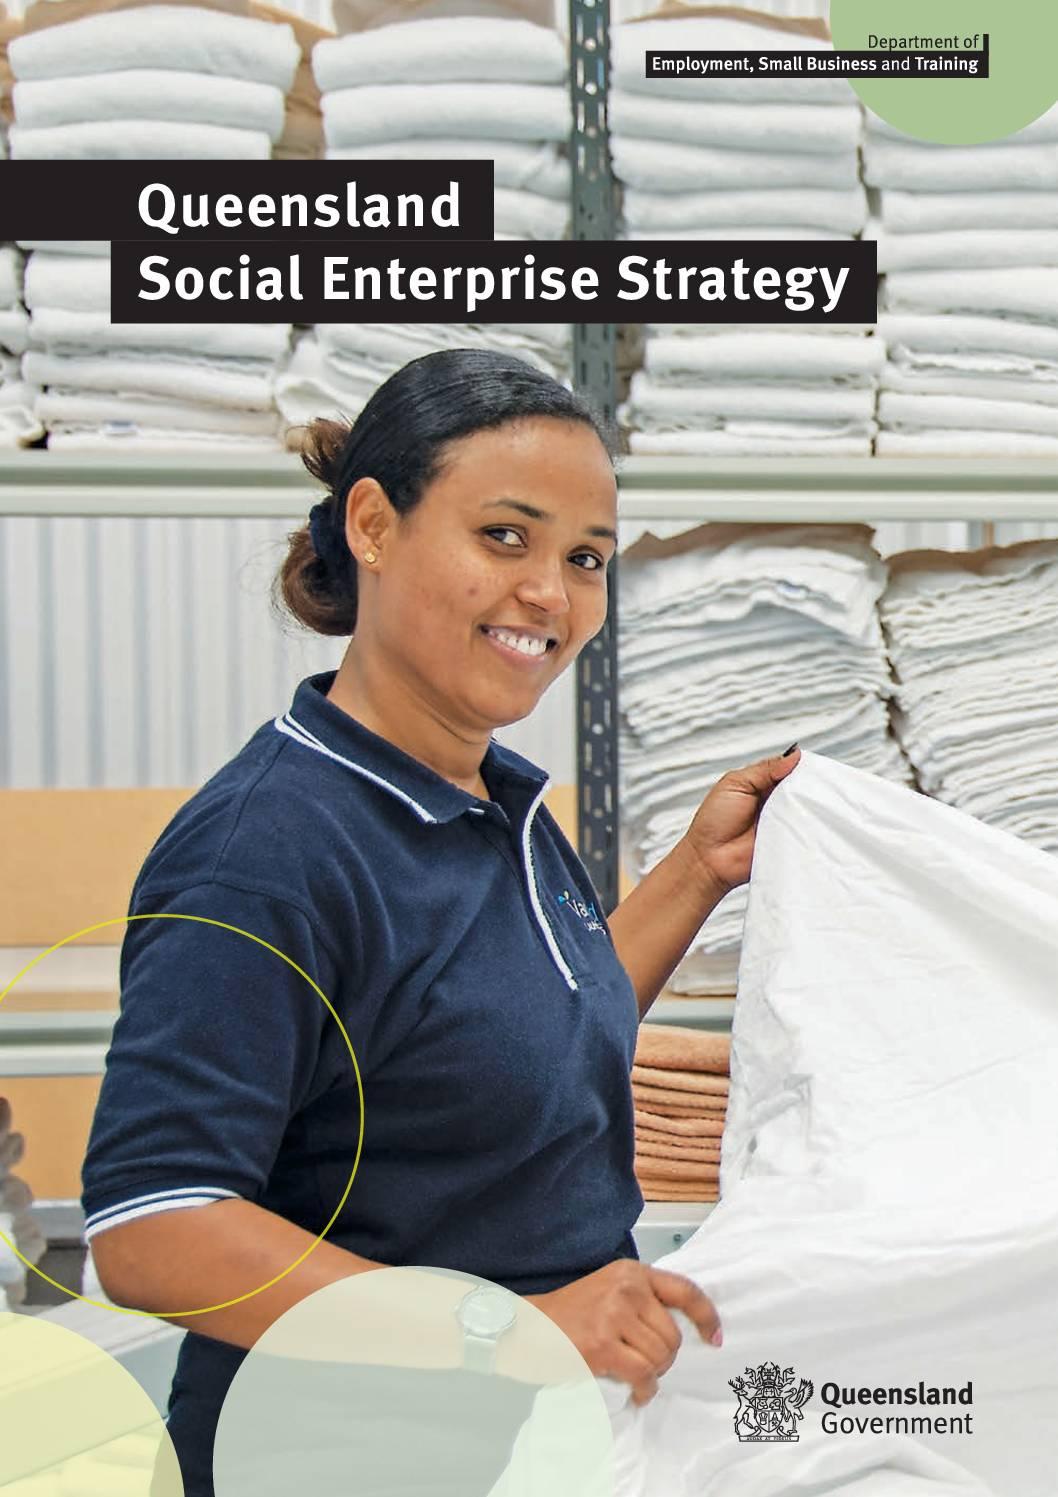 Queensland Social Enterprise Strategy